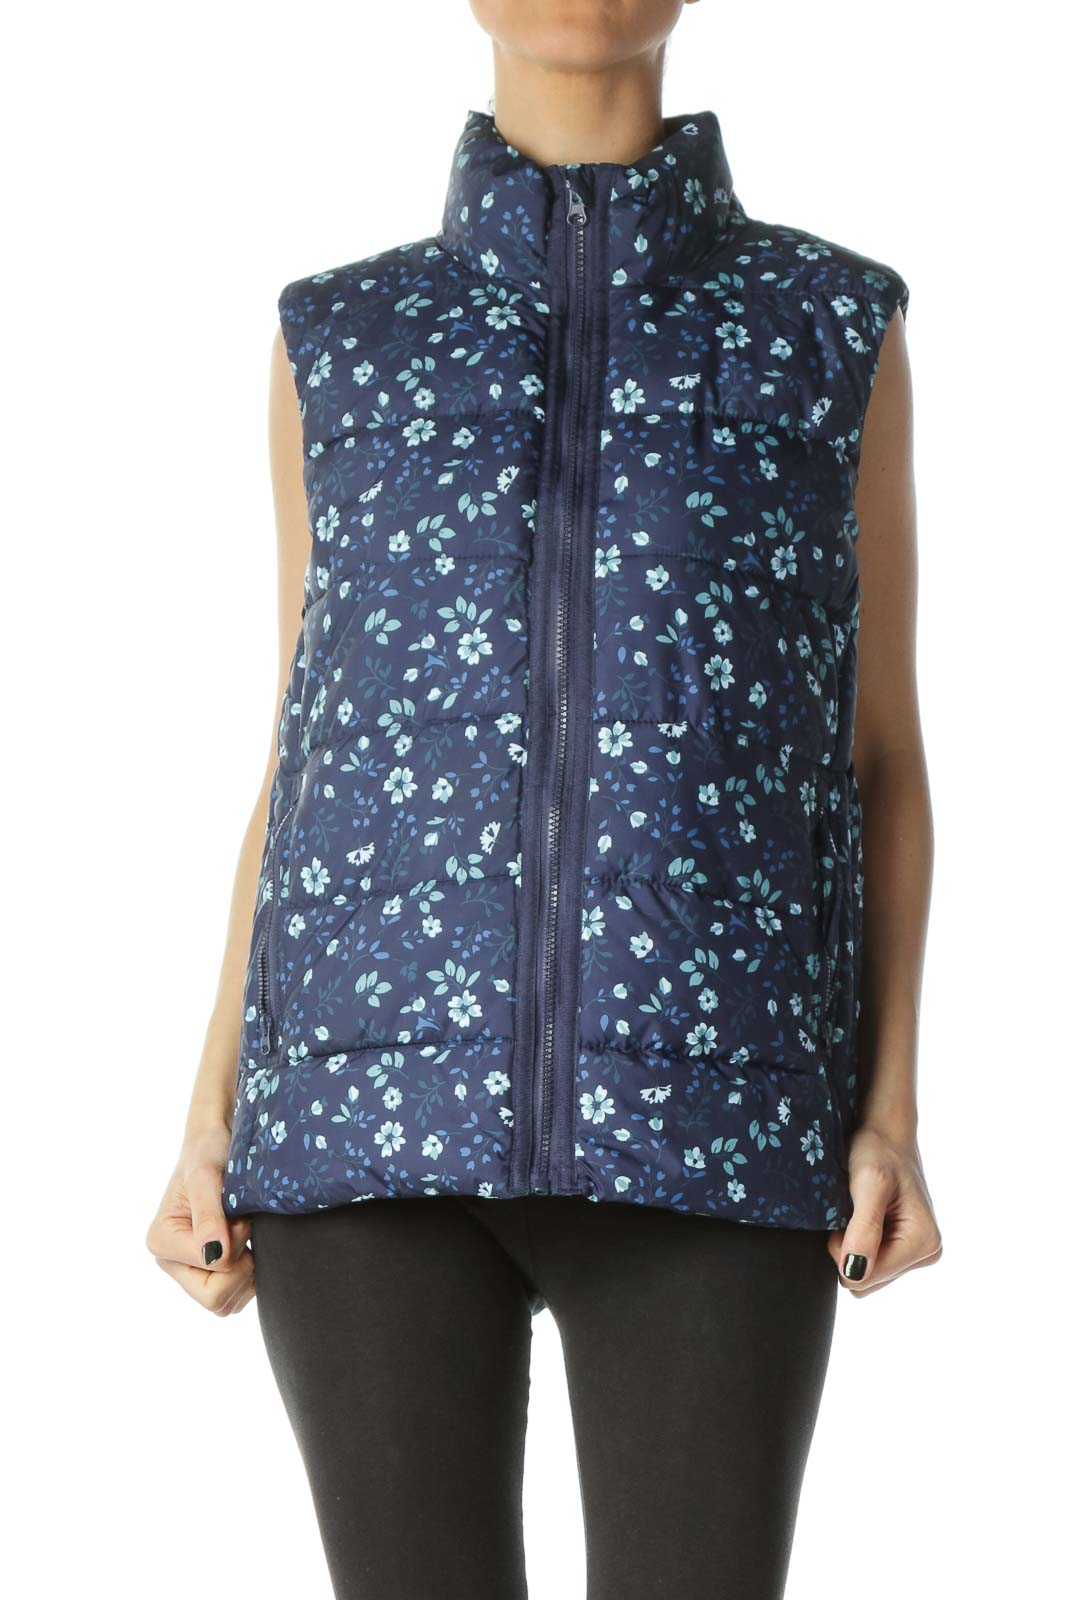 Blue Flower Print Zippered Puffy Vest